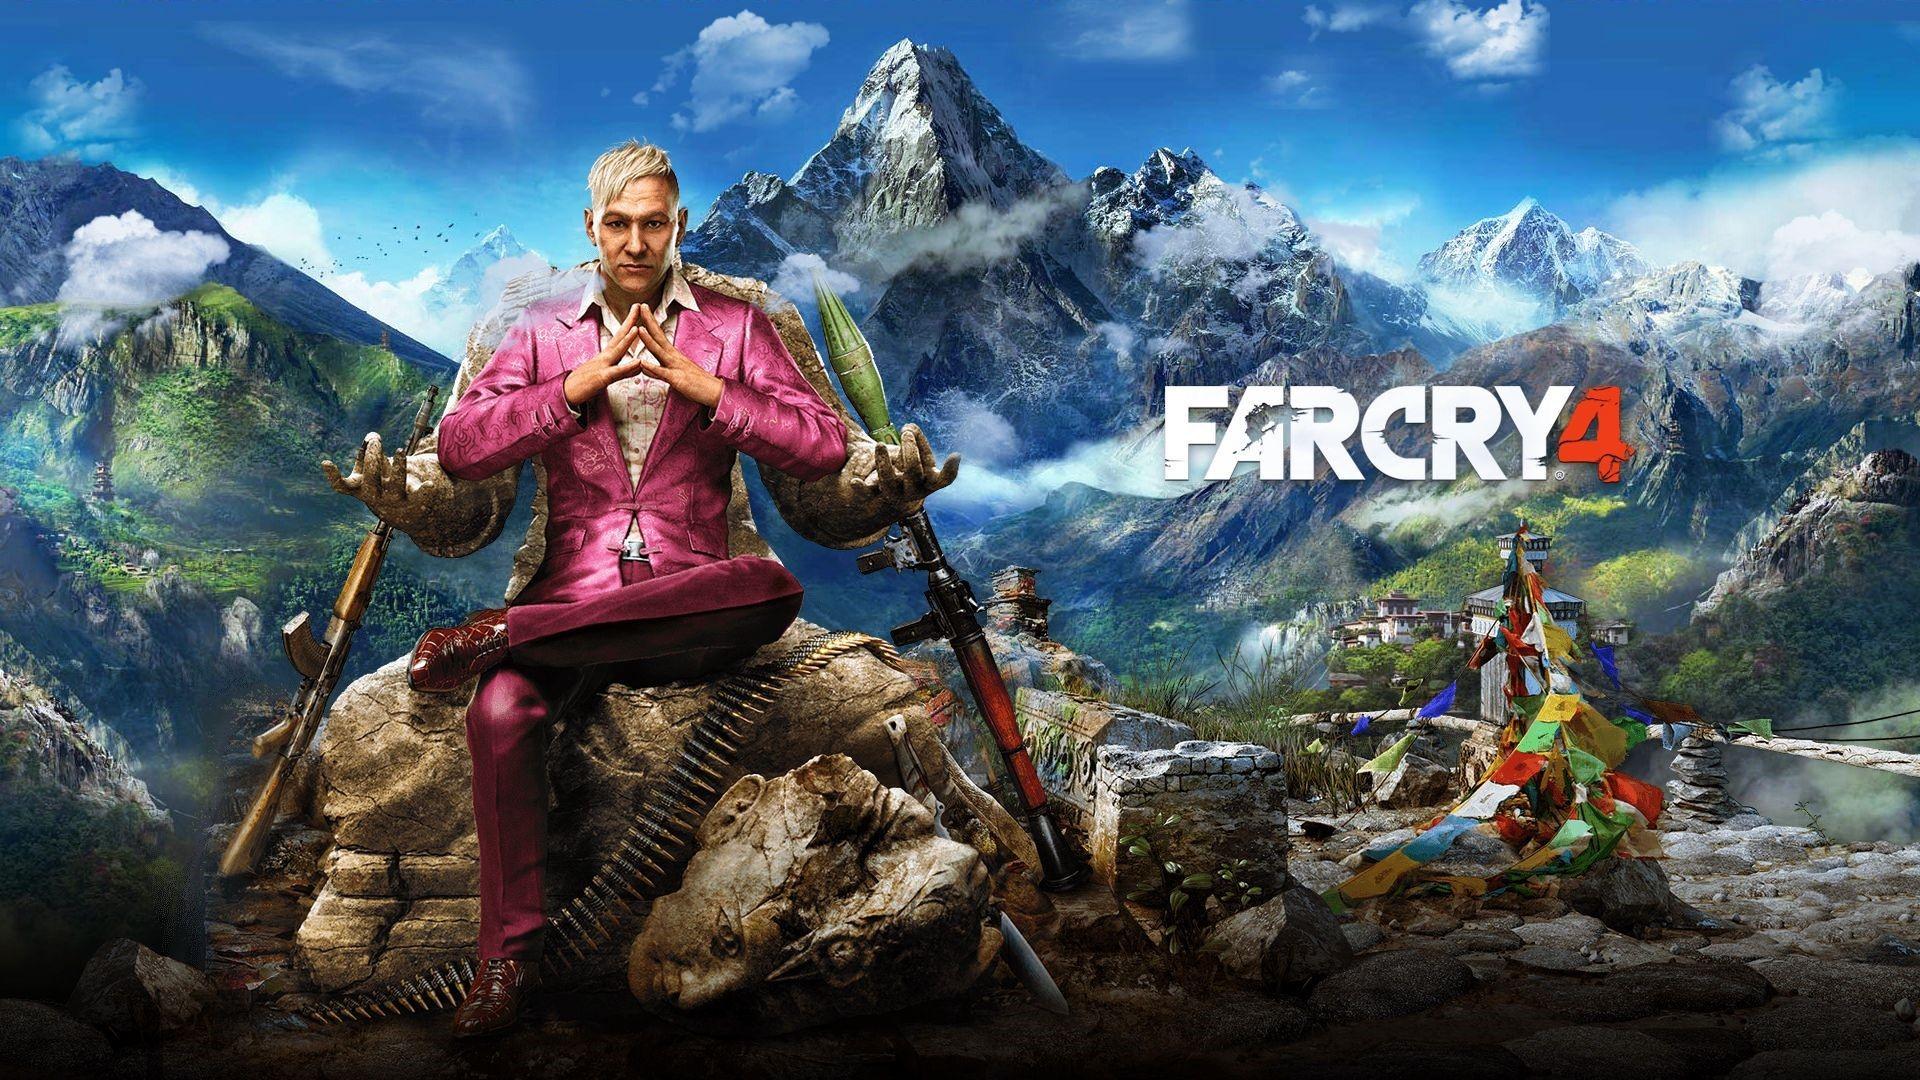 Far Cry 4 [Uplay] (почта+смена данных) [PC]